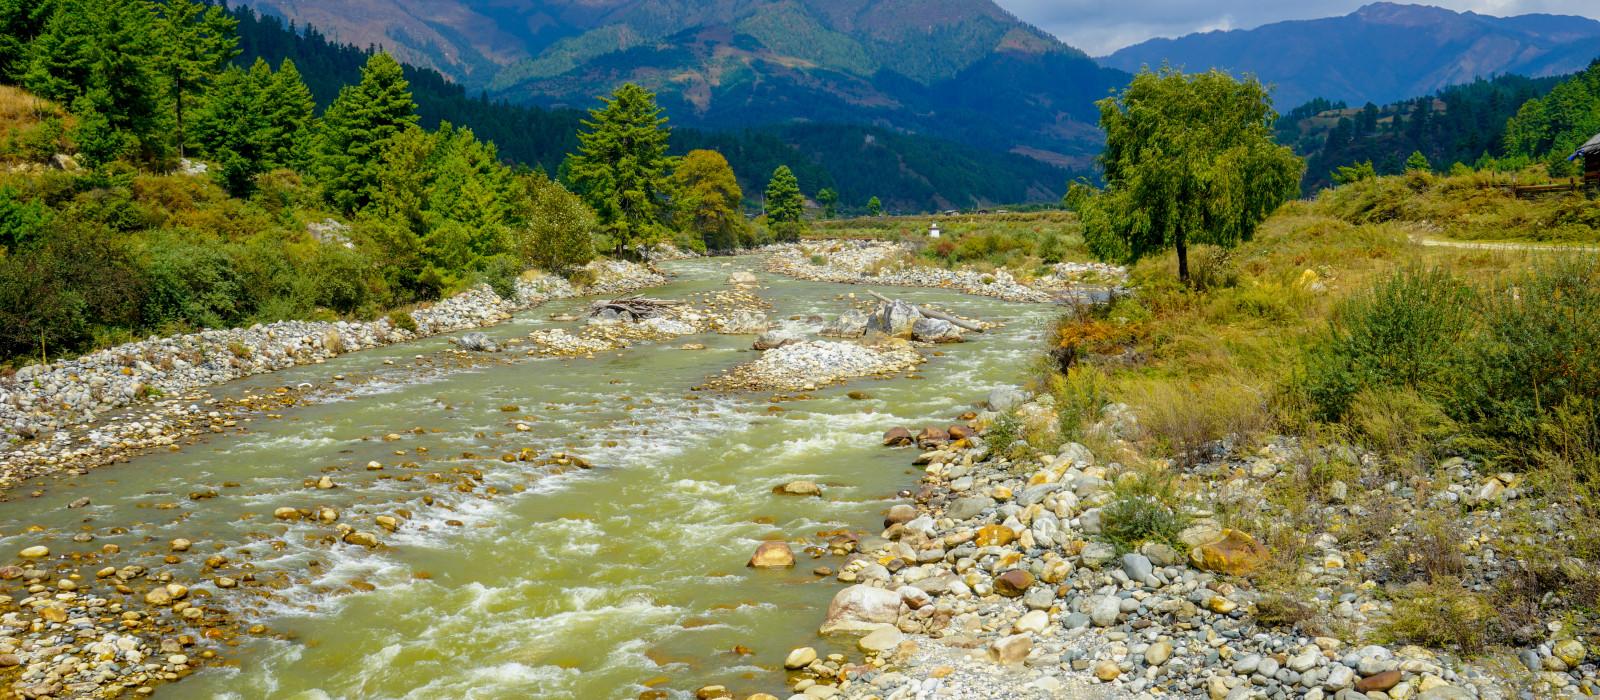 Destination Bumthang Tang Valley Bhutan